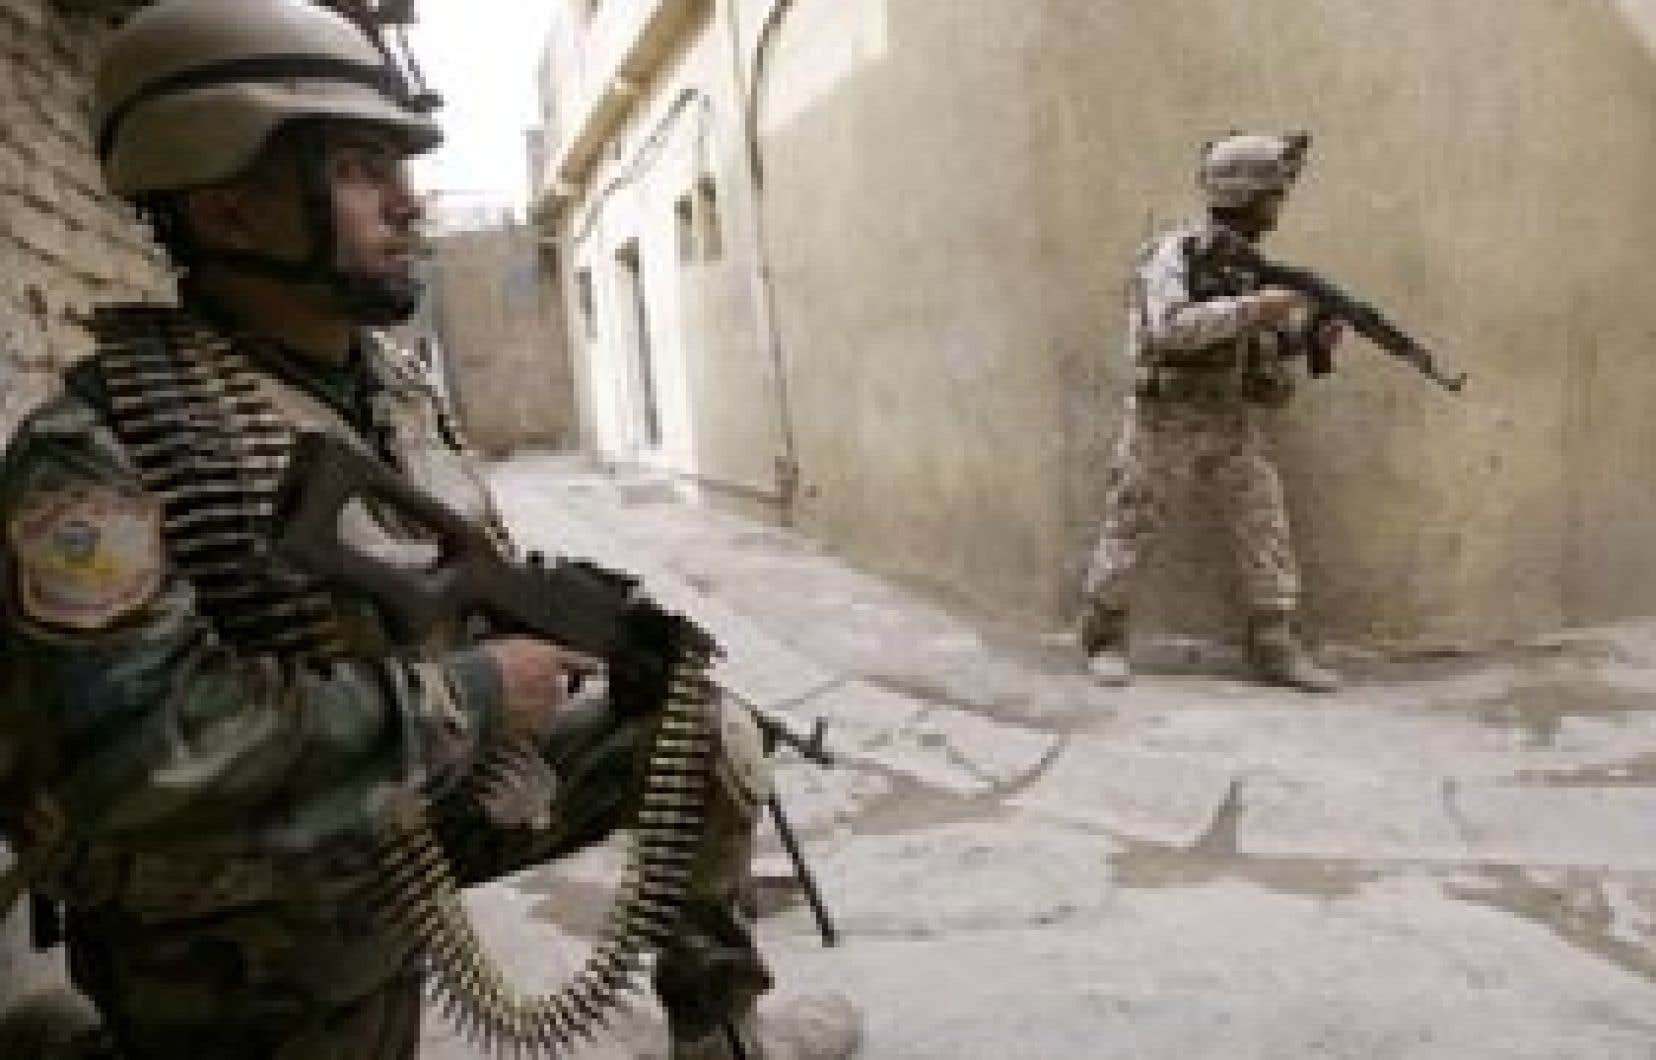 Les militaires irakiens ont investi le quartier de Fadel, à Bagdad.